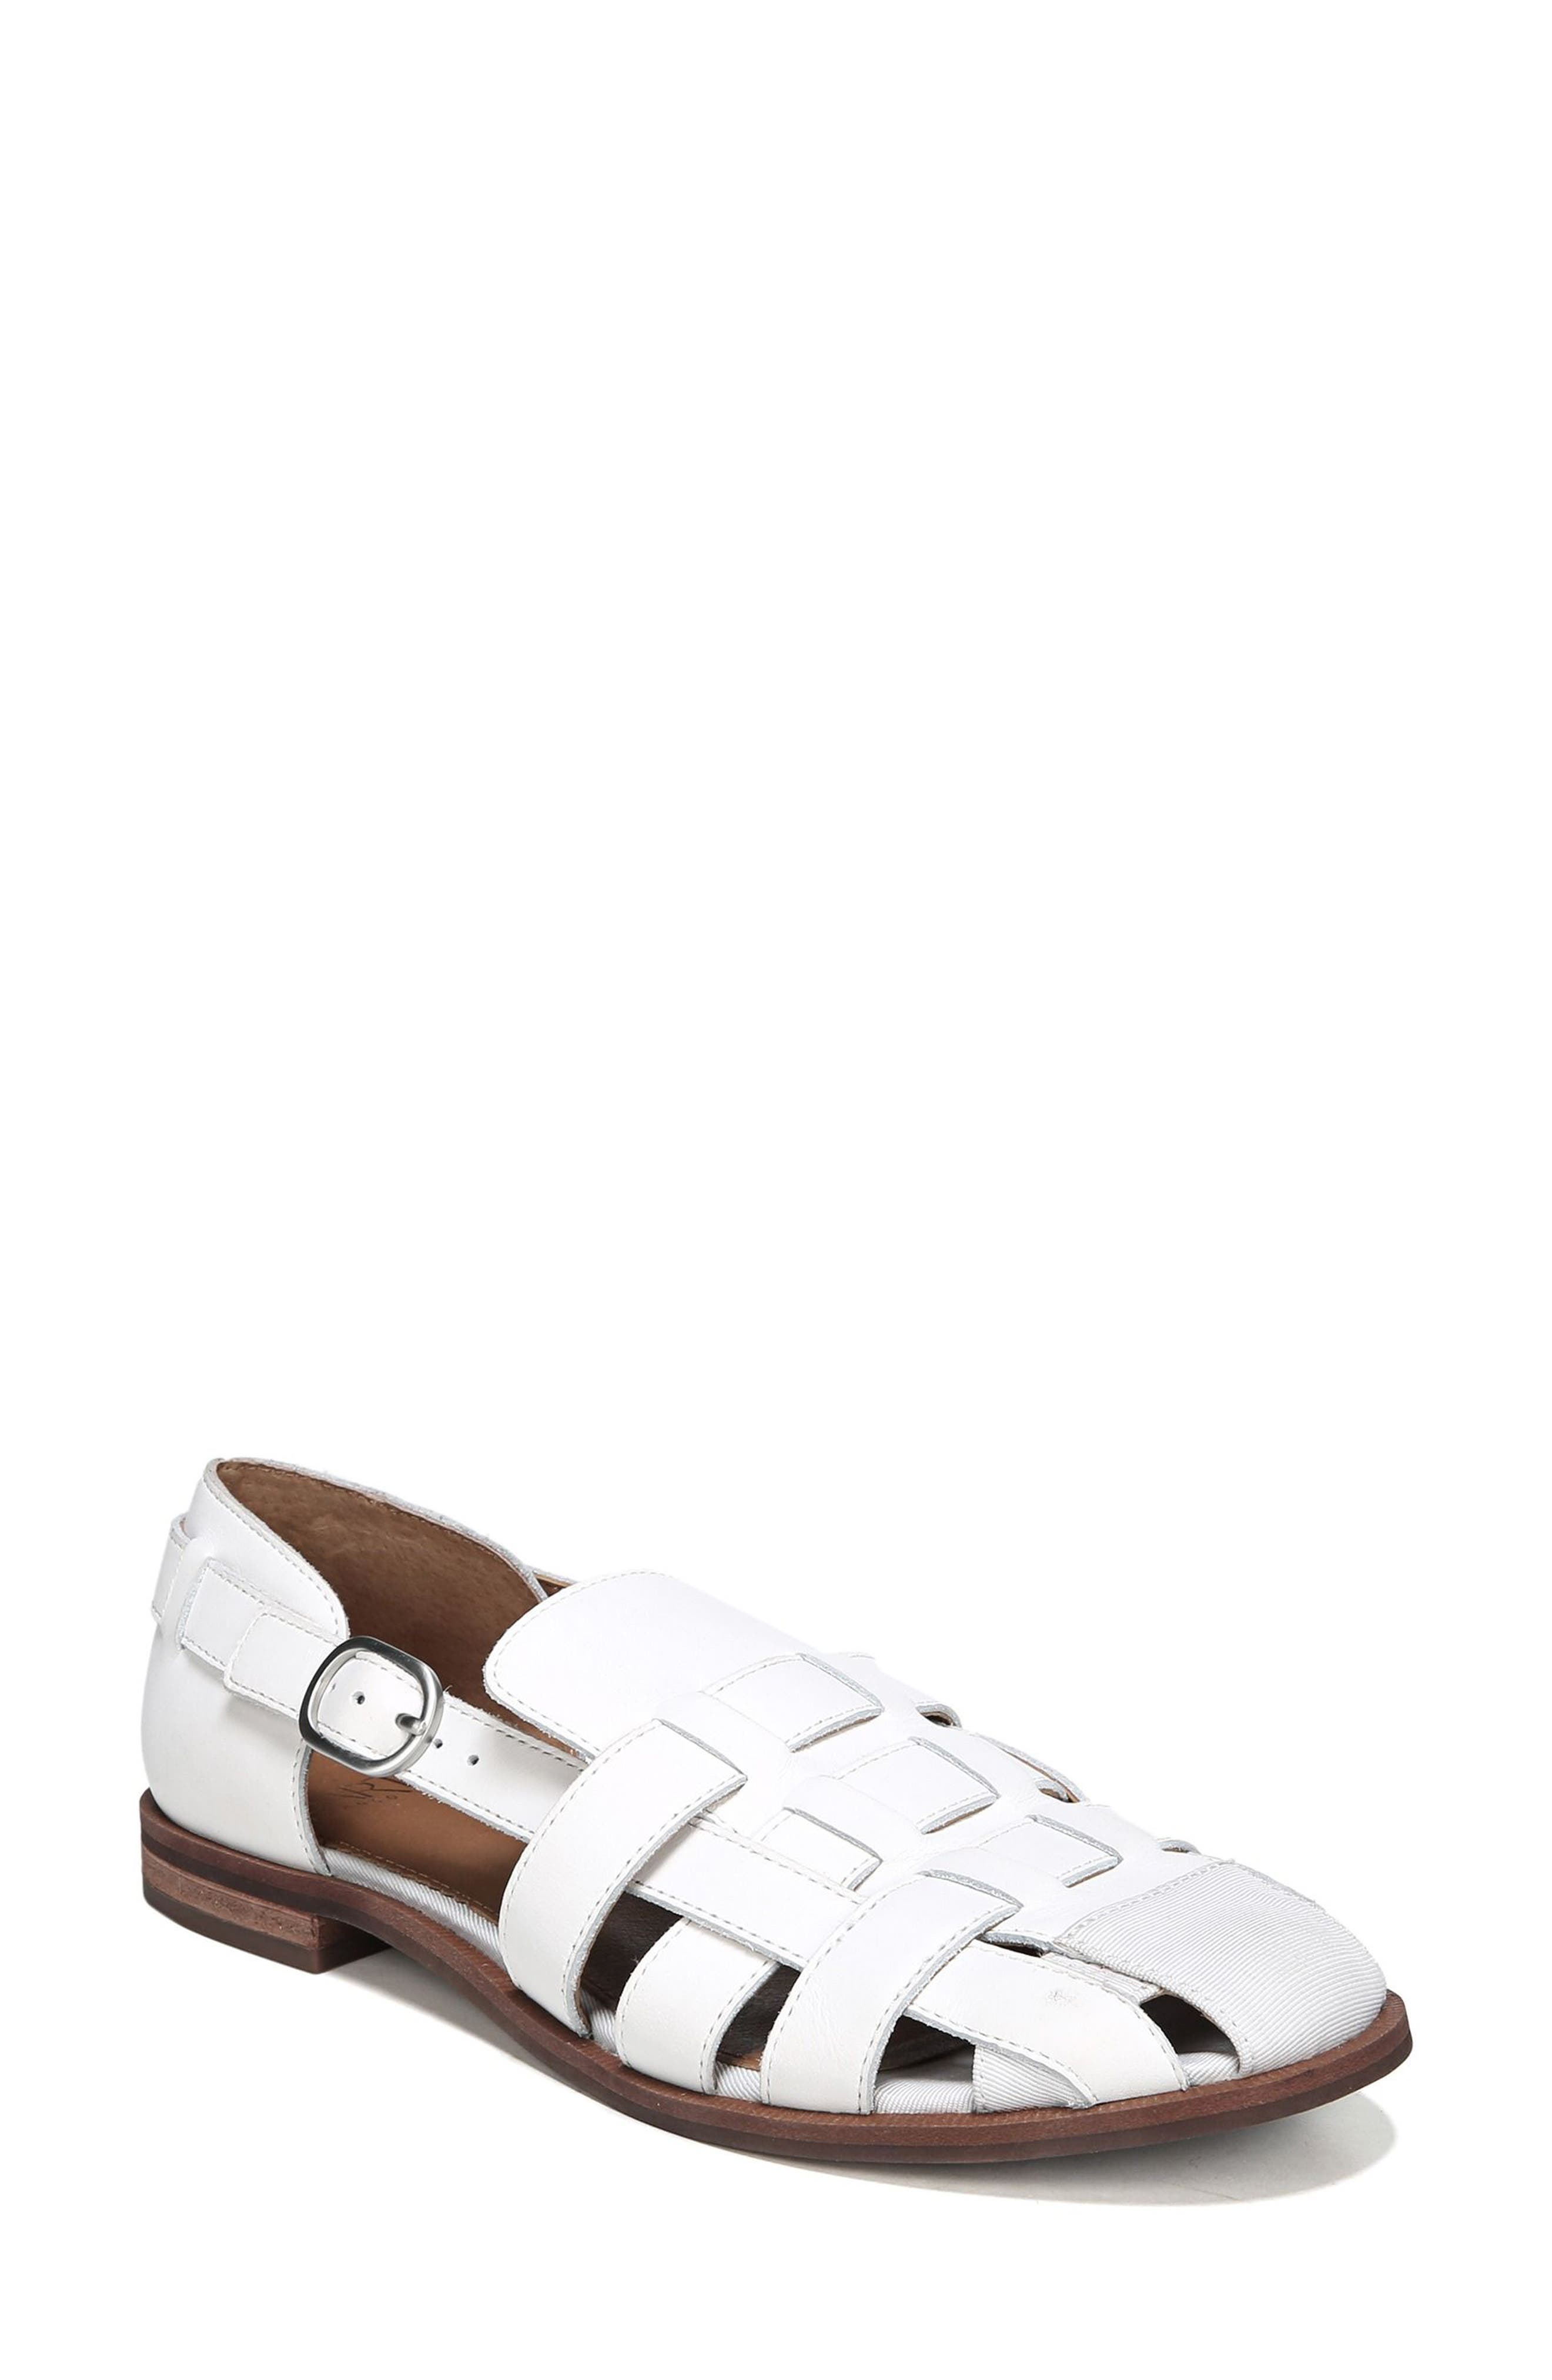 Lulu Fisherman Sandal,                             Main thumbnail 1, color,                             Bright White Leather